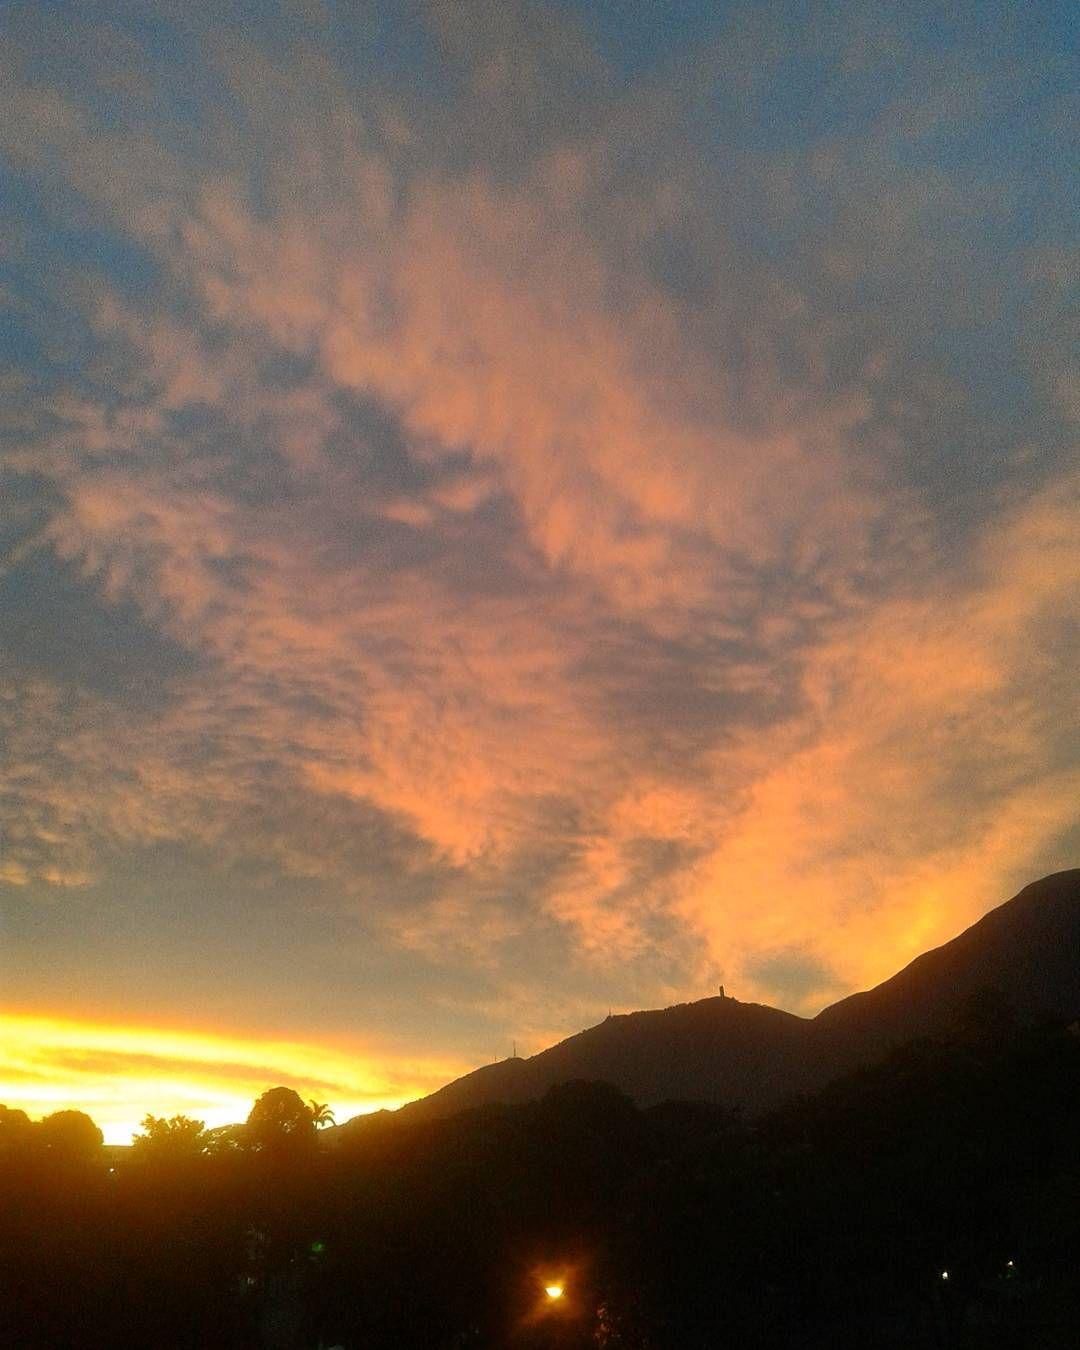 "93 Me gusta, 9 comentarios - Mara (@mara.jg) en Instagram: ""Mi atardecer de hoy// my sunset today... #Caracas #Venezuela #atardecer #sunset #sunset_captures_…"""